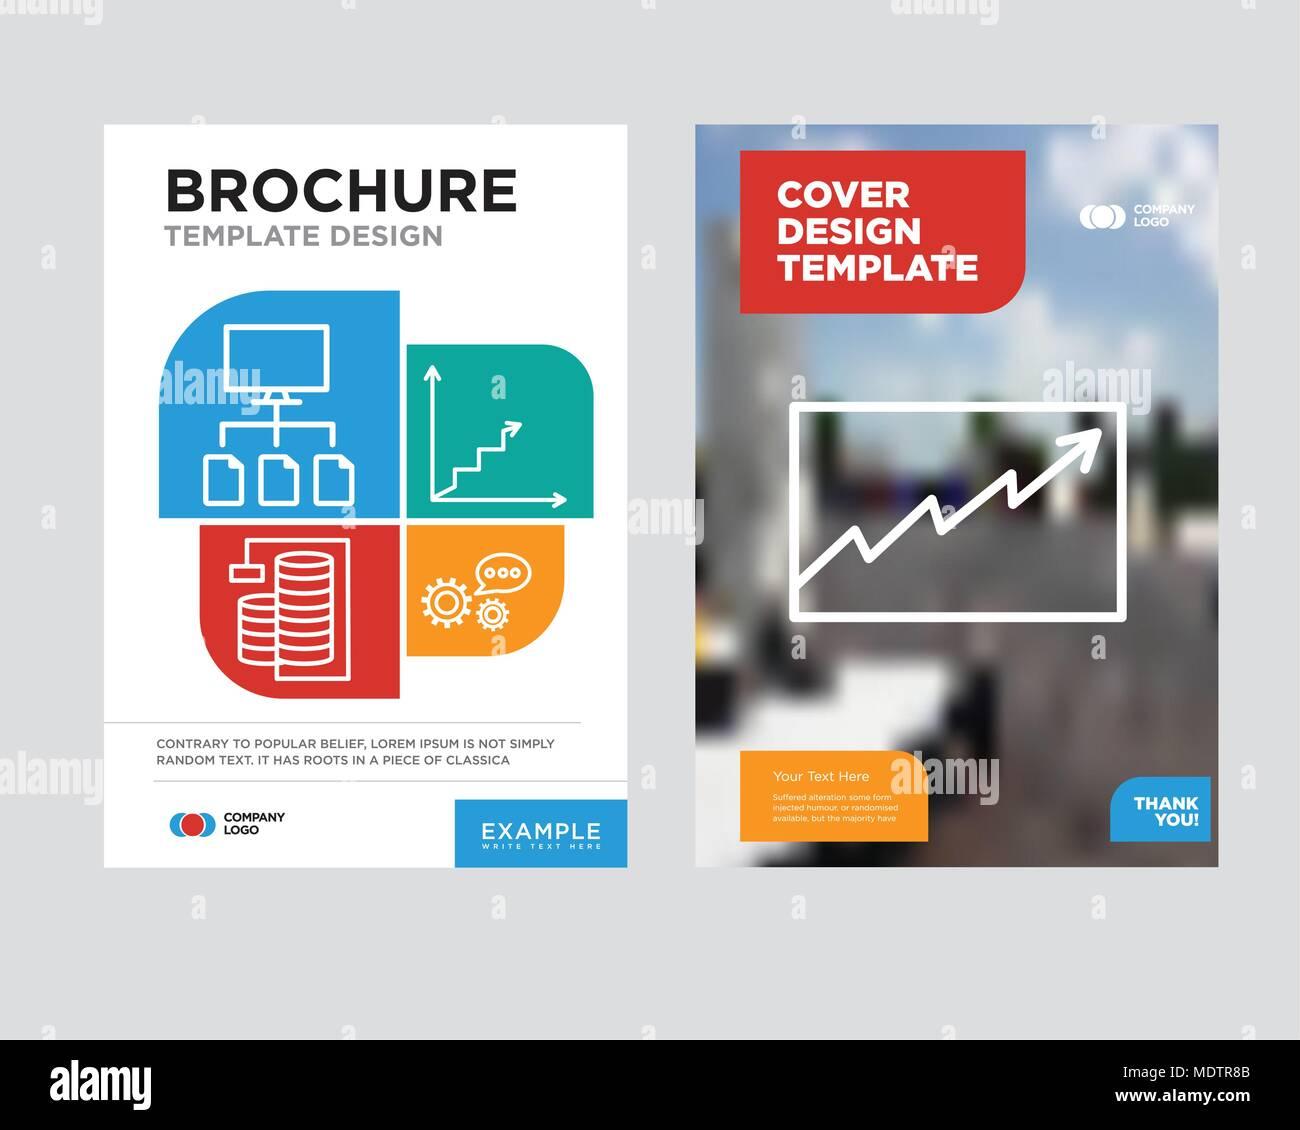 Data Analytics Brochure Flyer Design Template With Abstract Photo  Background, 3D Data Analytics, Data Analytics Ascending, Database Analysis,  Data Flo